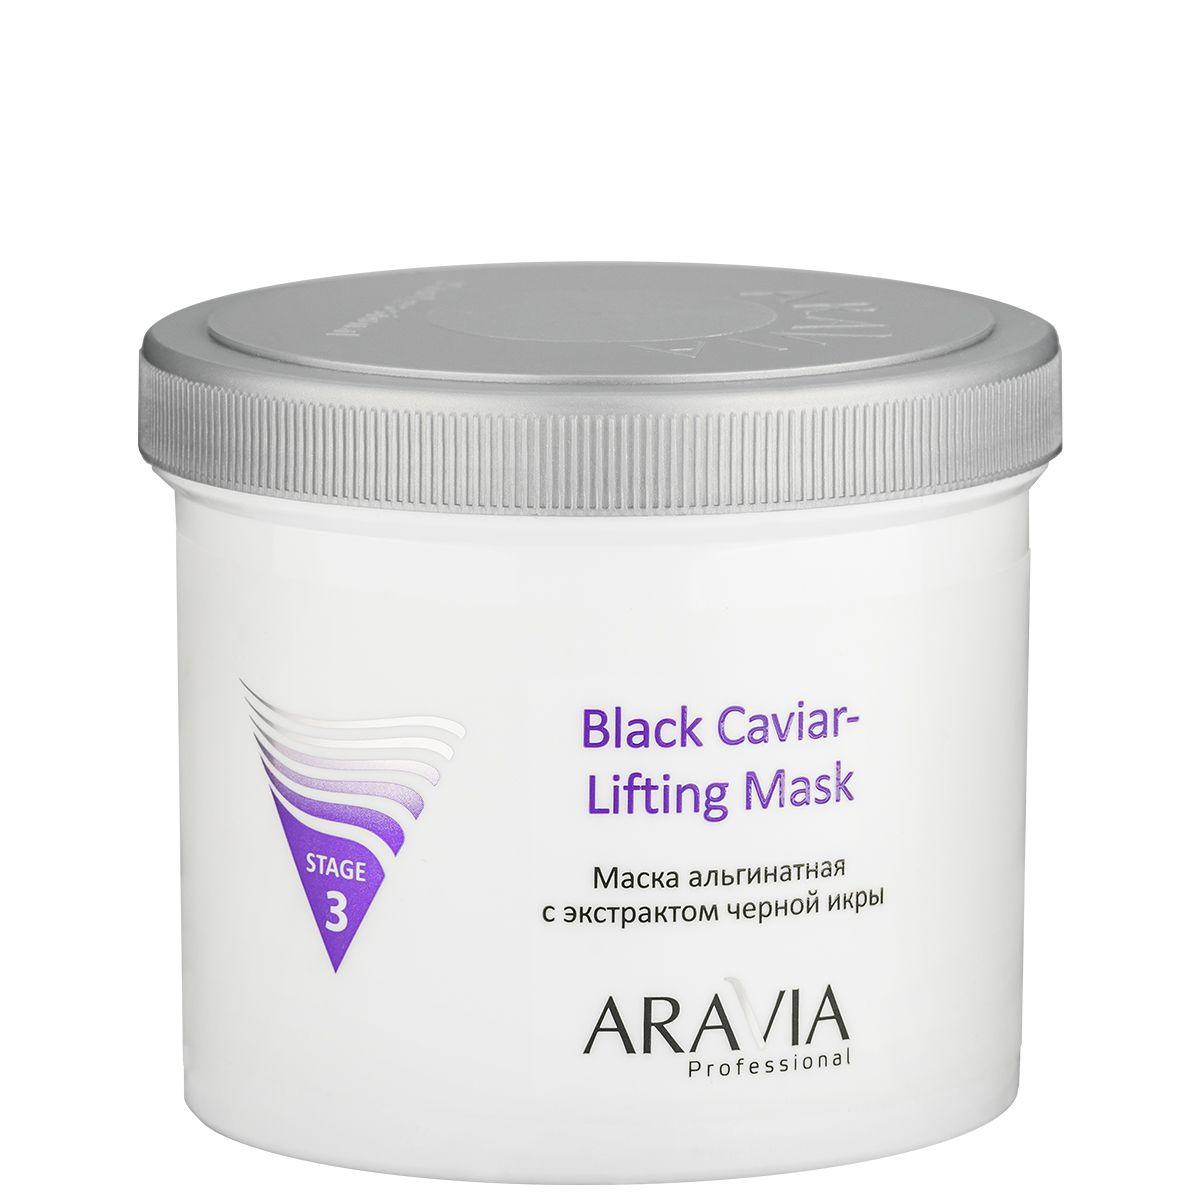 Mask Alginate With Extract Black Caviar Black Caviar-lifting, 550 Ml